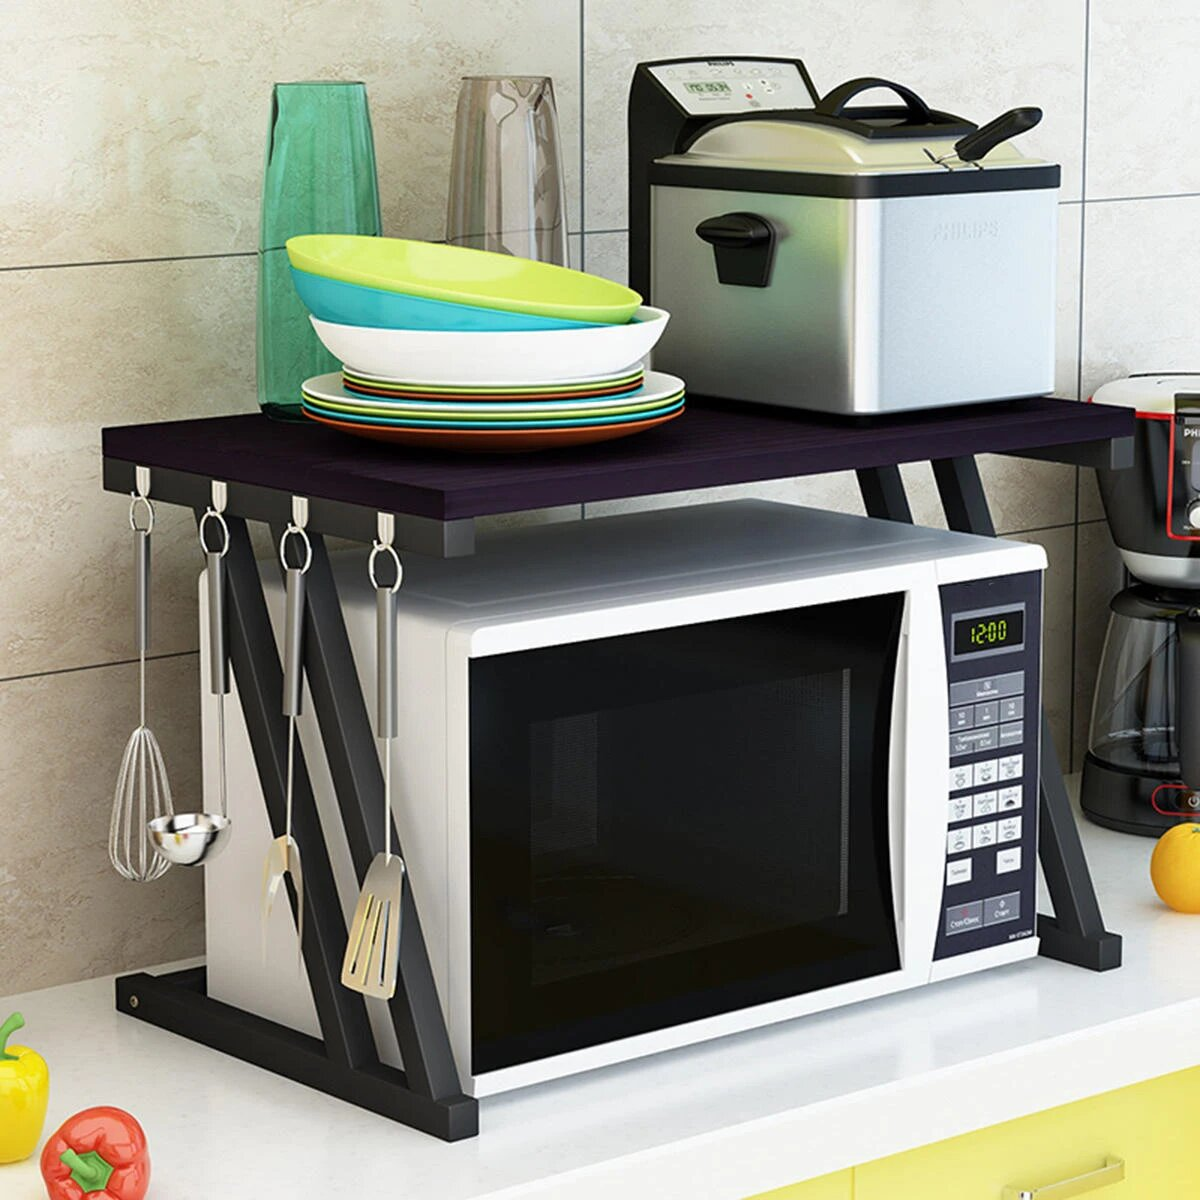 2 tier kitchen baker rack microwave oven stand storage cart workstation shelf desktop table top organizer